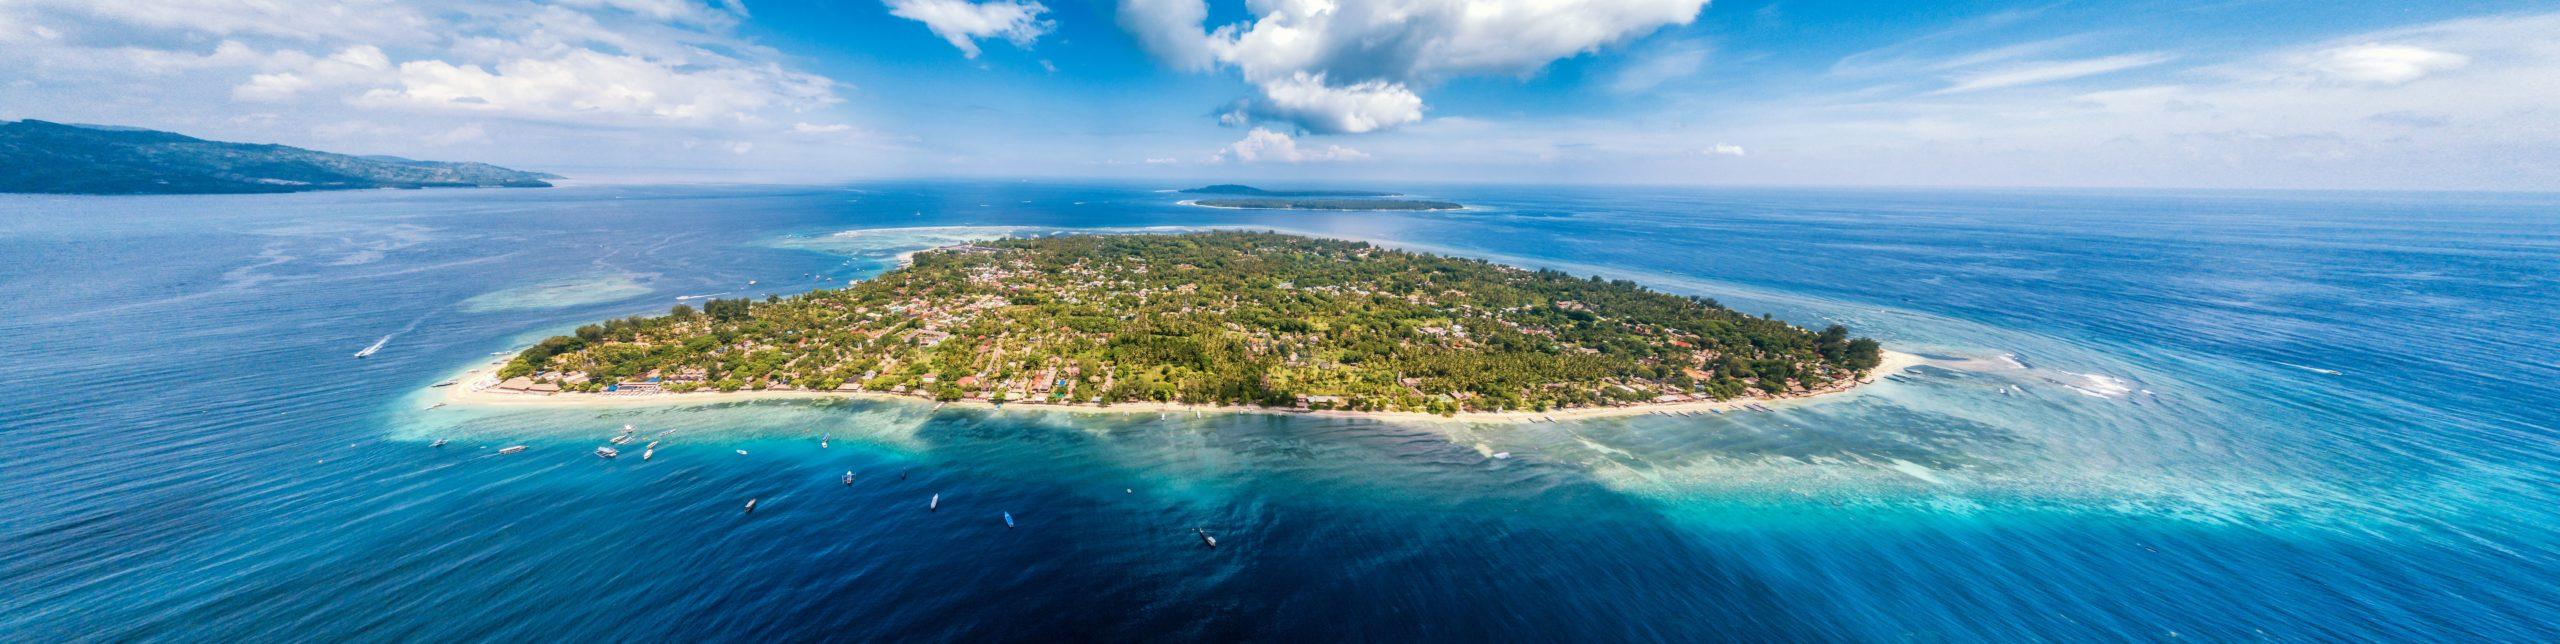 British Virgin Islands honeymoon destination